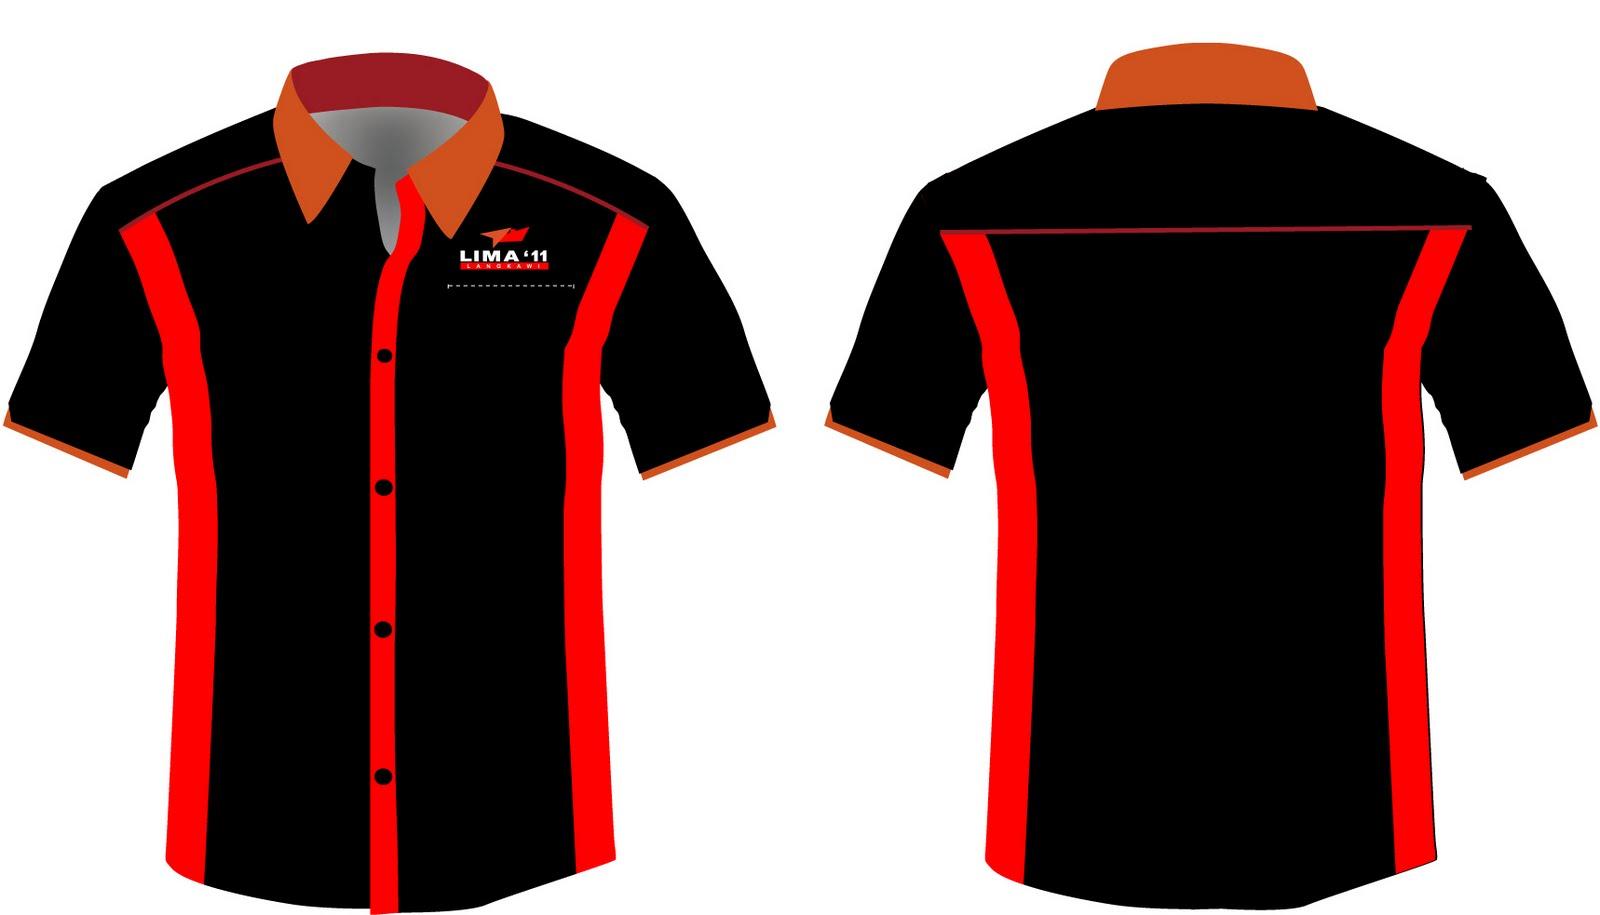 Corporate Shirt Design Template Vector